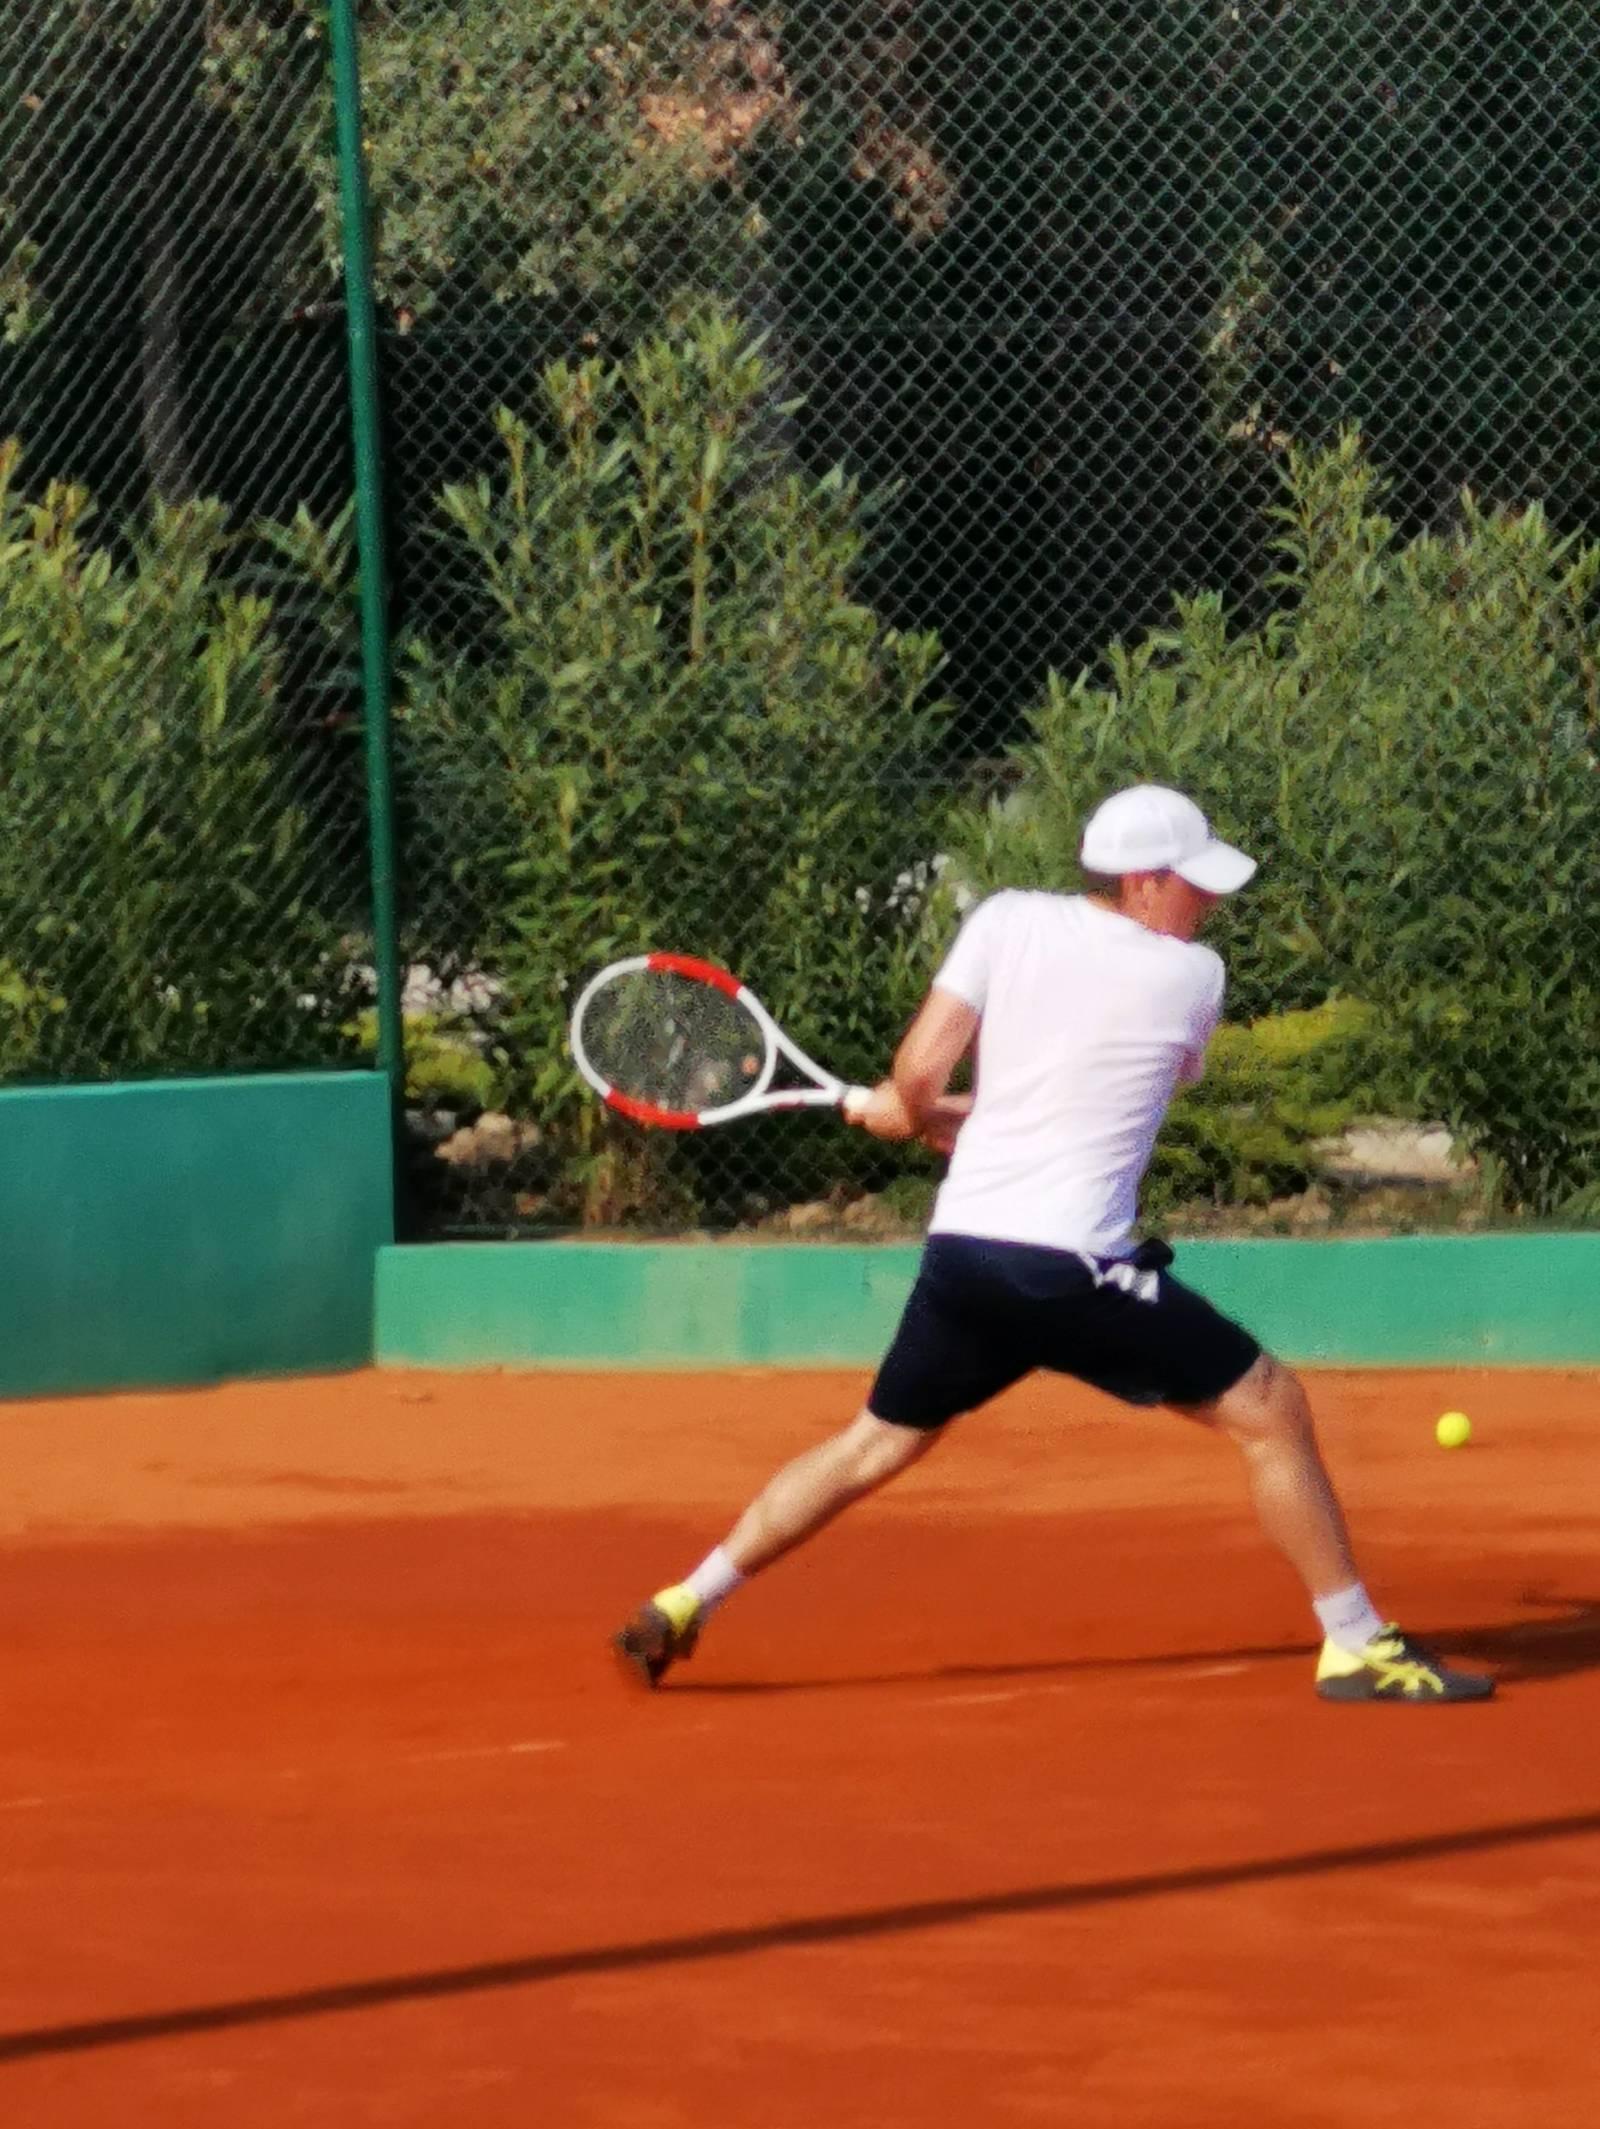 tennis-holidays-croatia-2019-31.jpeg